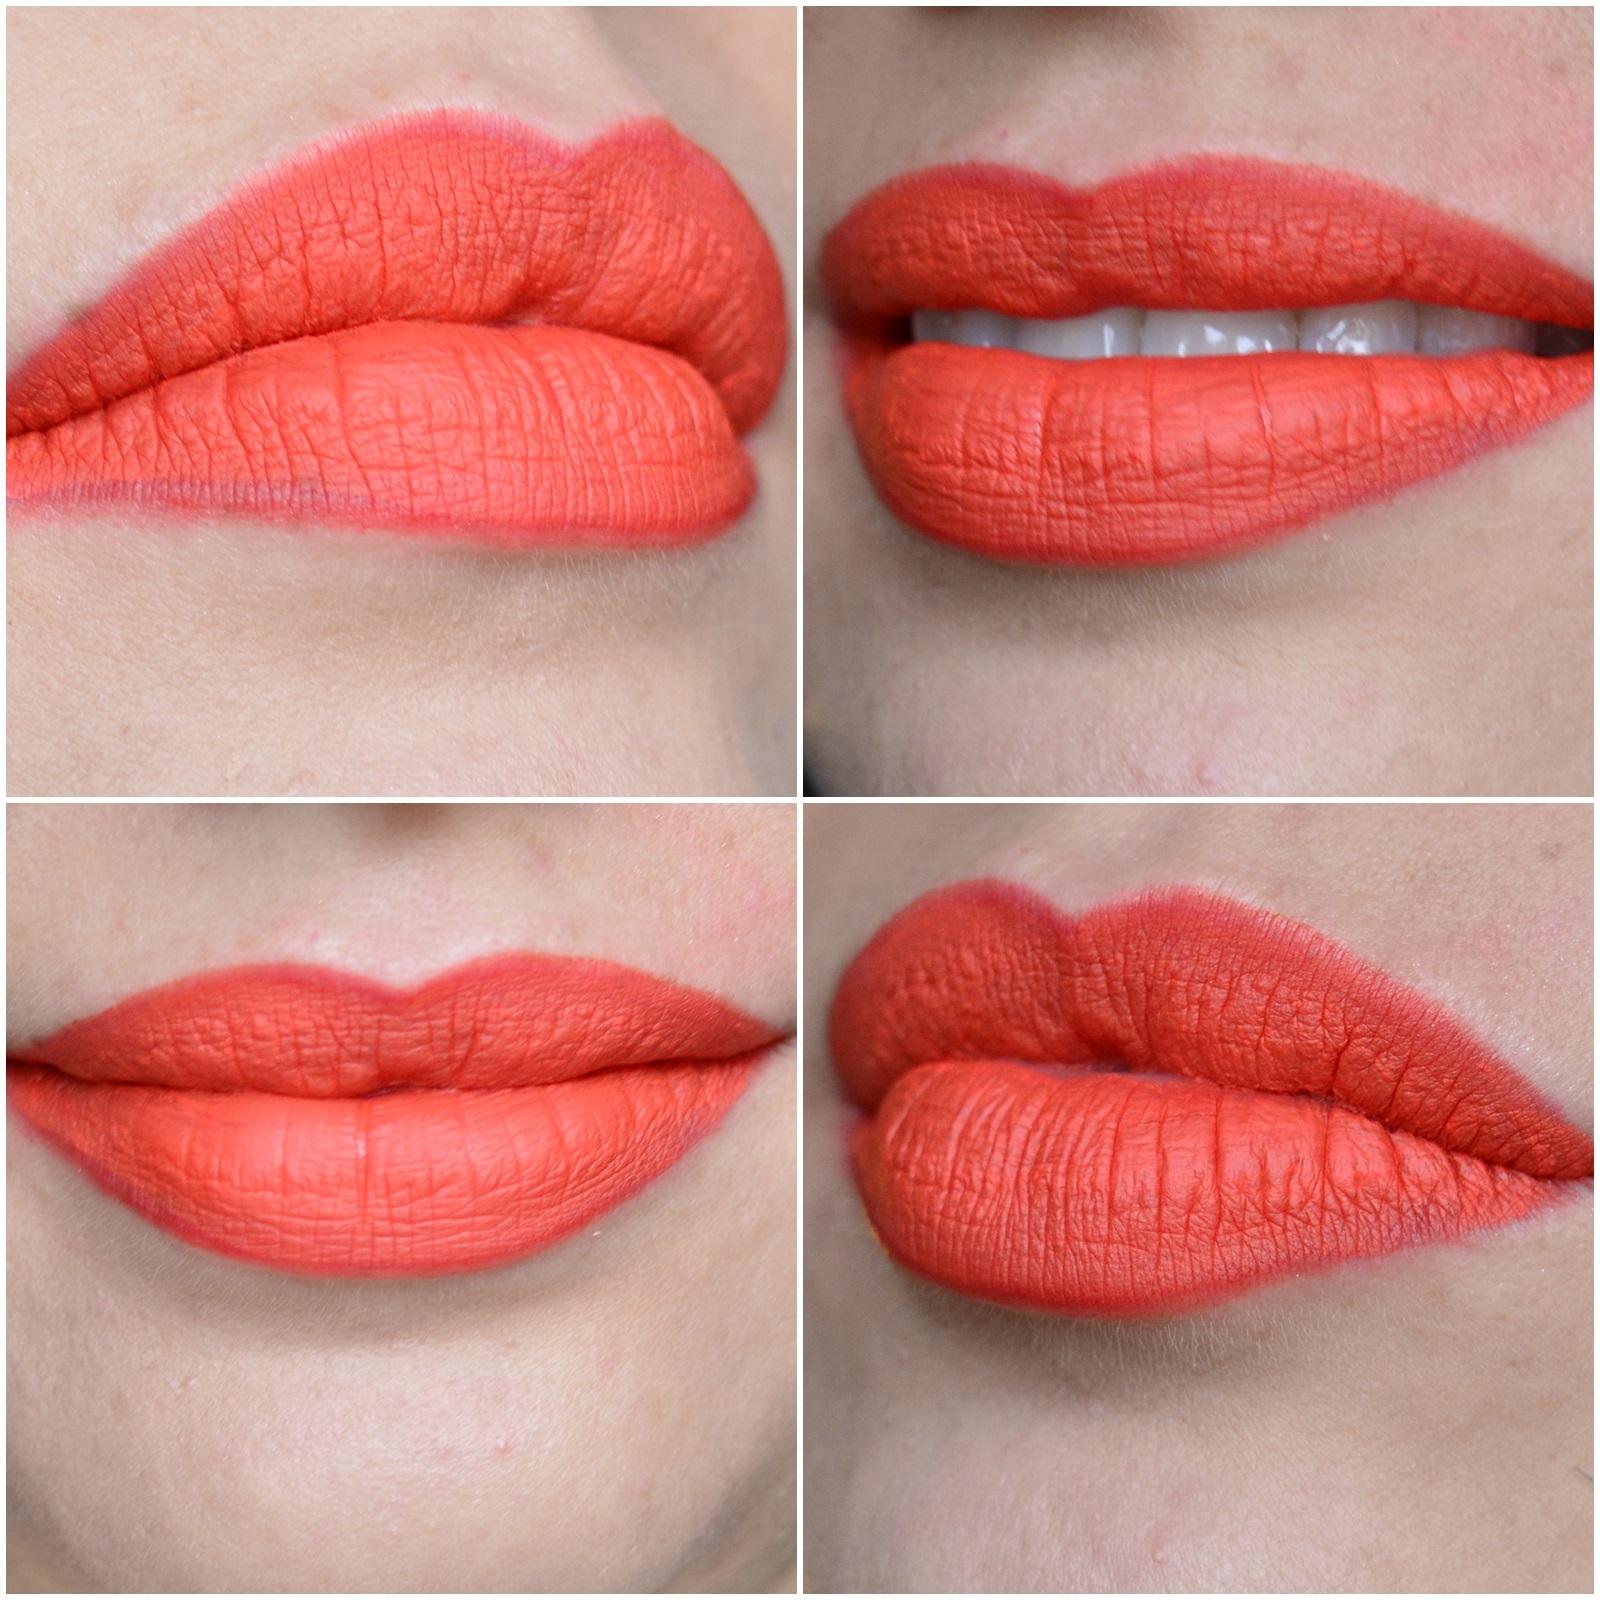 resenha-batom-unlimited-stylo-kiko-cosmetics-05-arancio-3